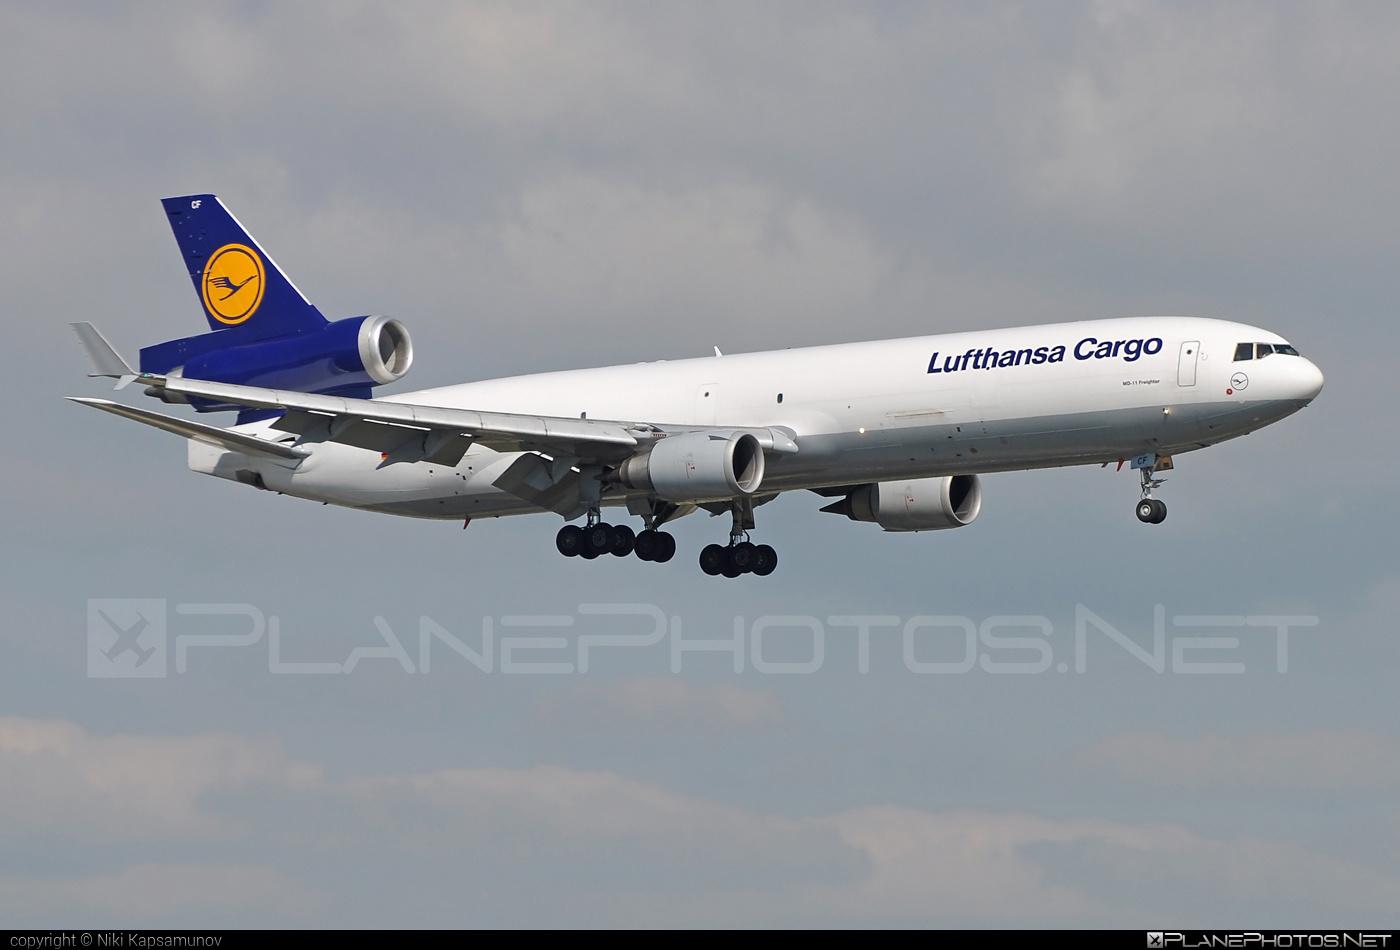 Lufthansa Cargo McDonnell Douglas MD-11F - D-ALCF #mcdonnelldouglas #mcdonnelldouglas11 #mcdonnelldouglas11f #mcdonnelldouglasmd11 #mcdonnelldouglasmd11f #md11 #md11f